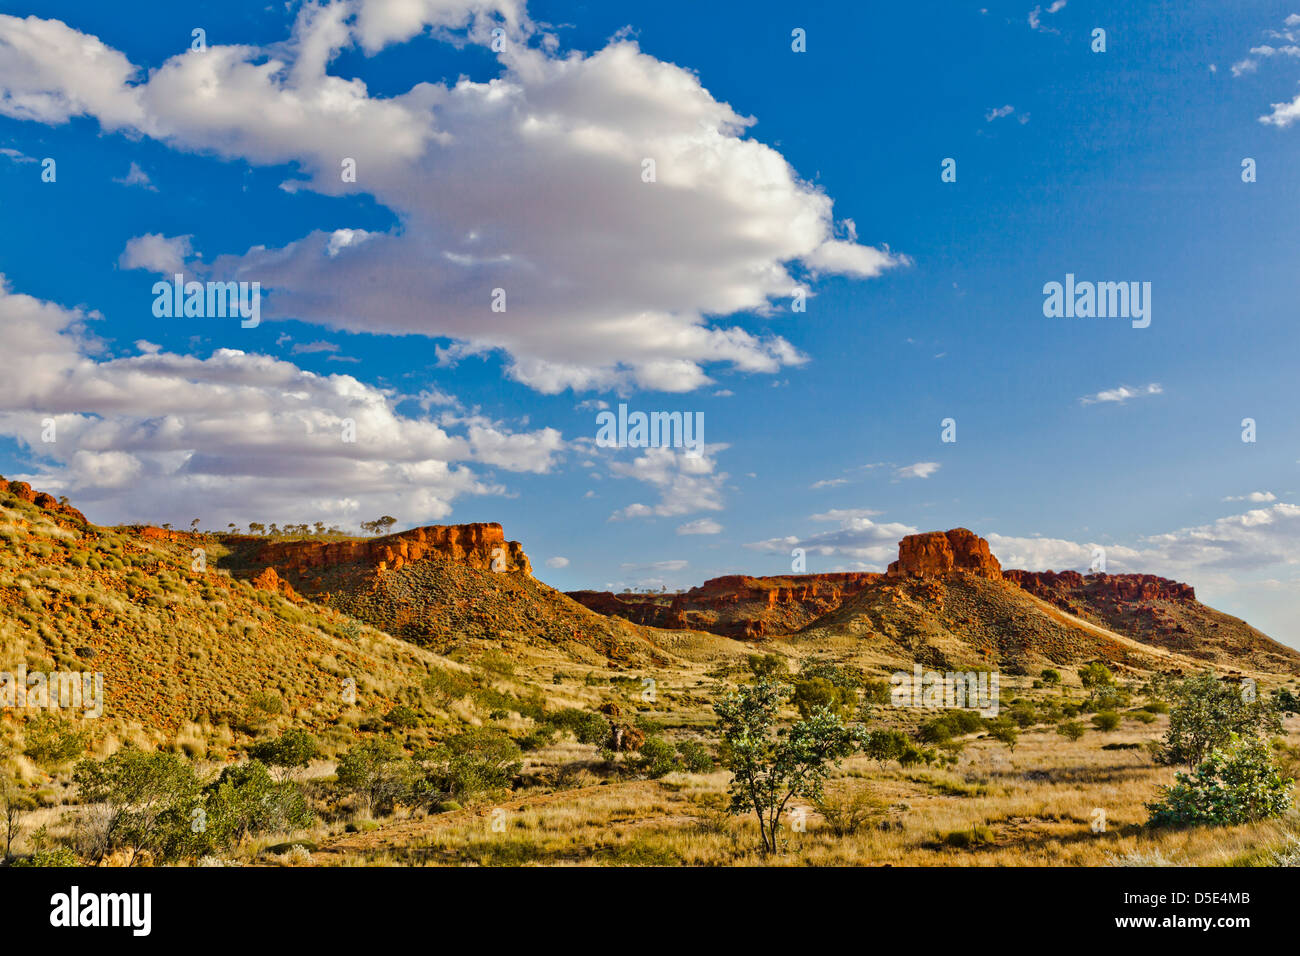 Australia, Western Australia, Kimberley, Gran carretera del norte cerca de Fitzroy Crossing Imagen De Stock